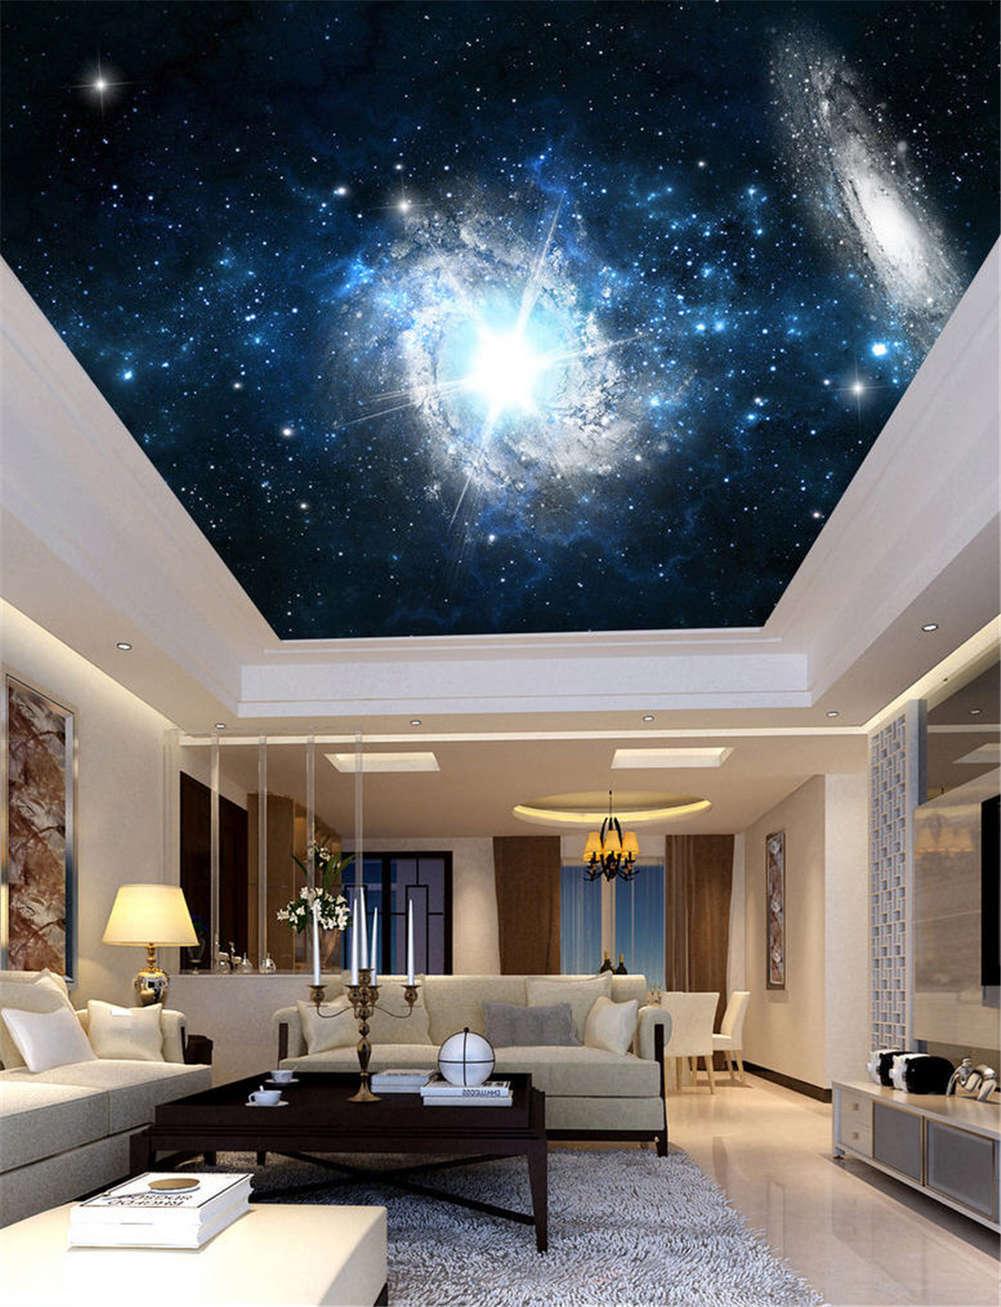 Salient Rummy Night 3D Ceiling Mural Full Wall Photo Wallpaper Print Home Decor